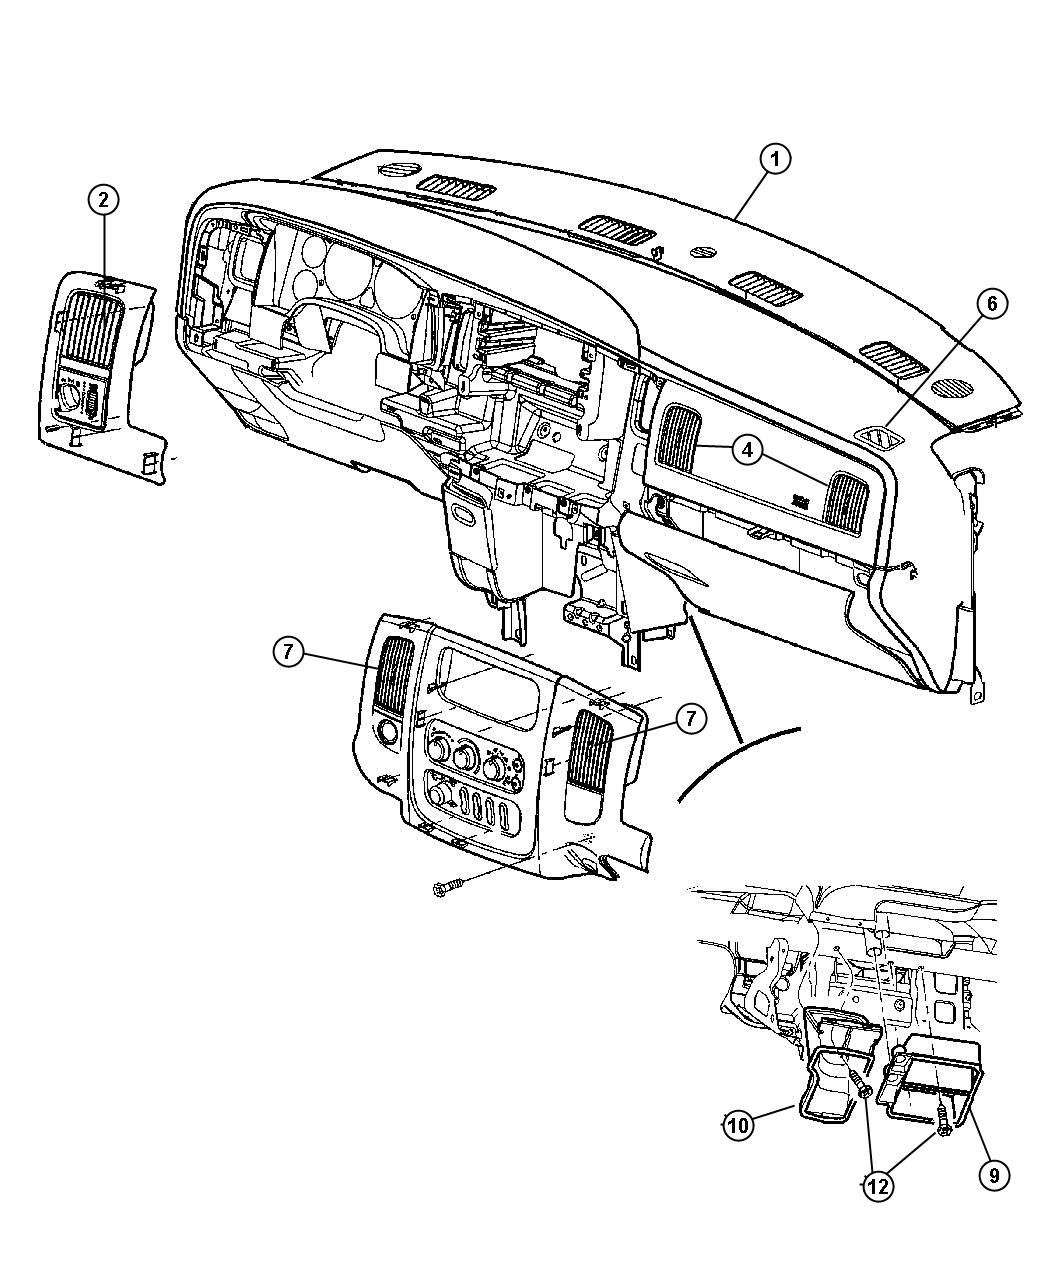 2003 Dodge Ram 1500 Cover. Instrument panel. [l5], [l5